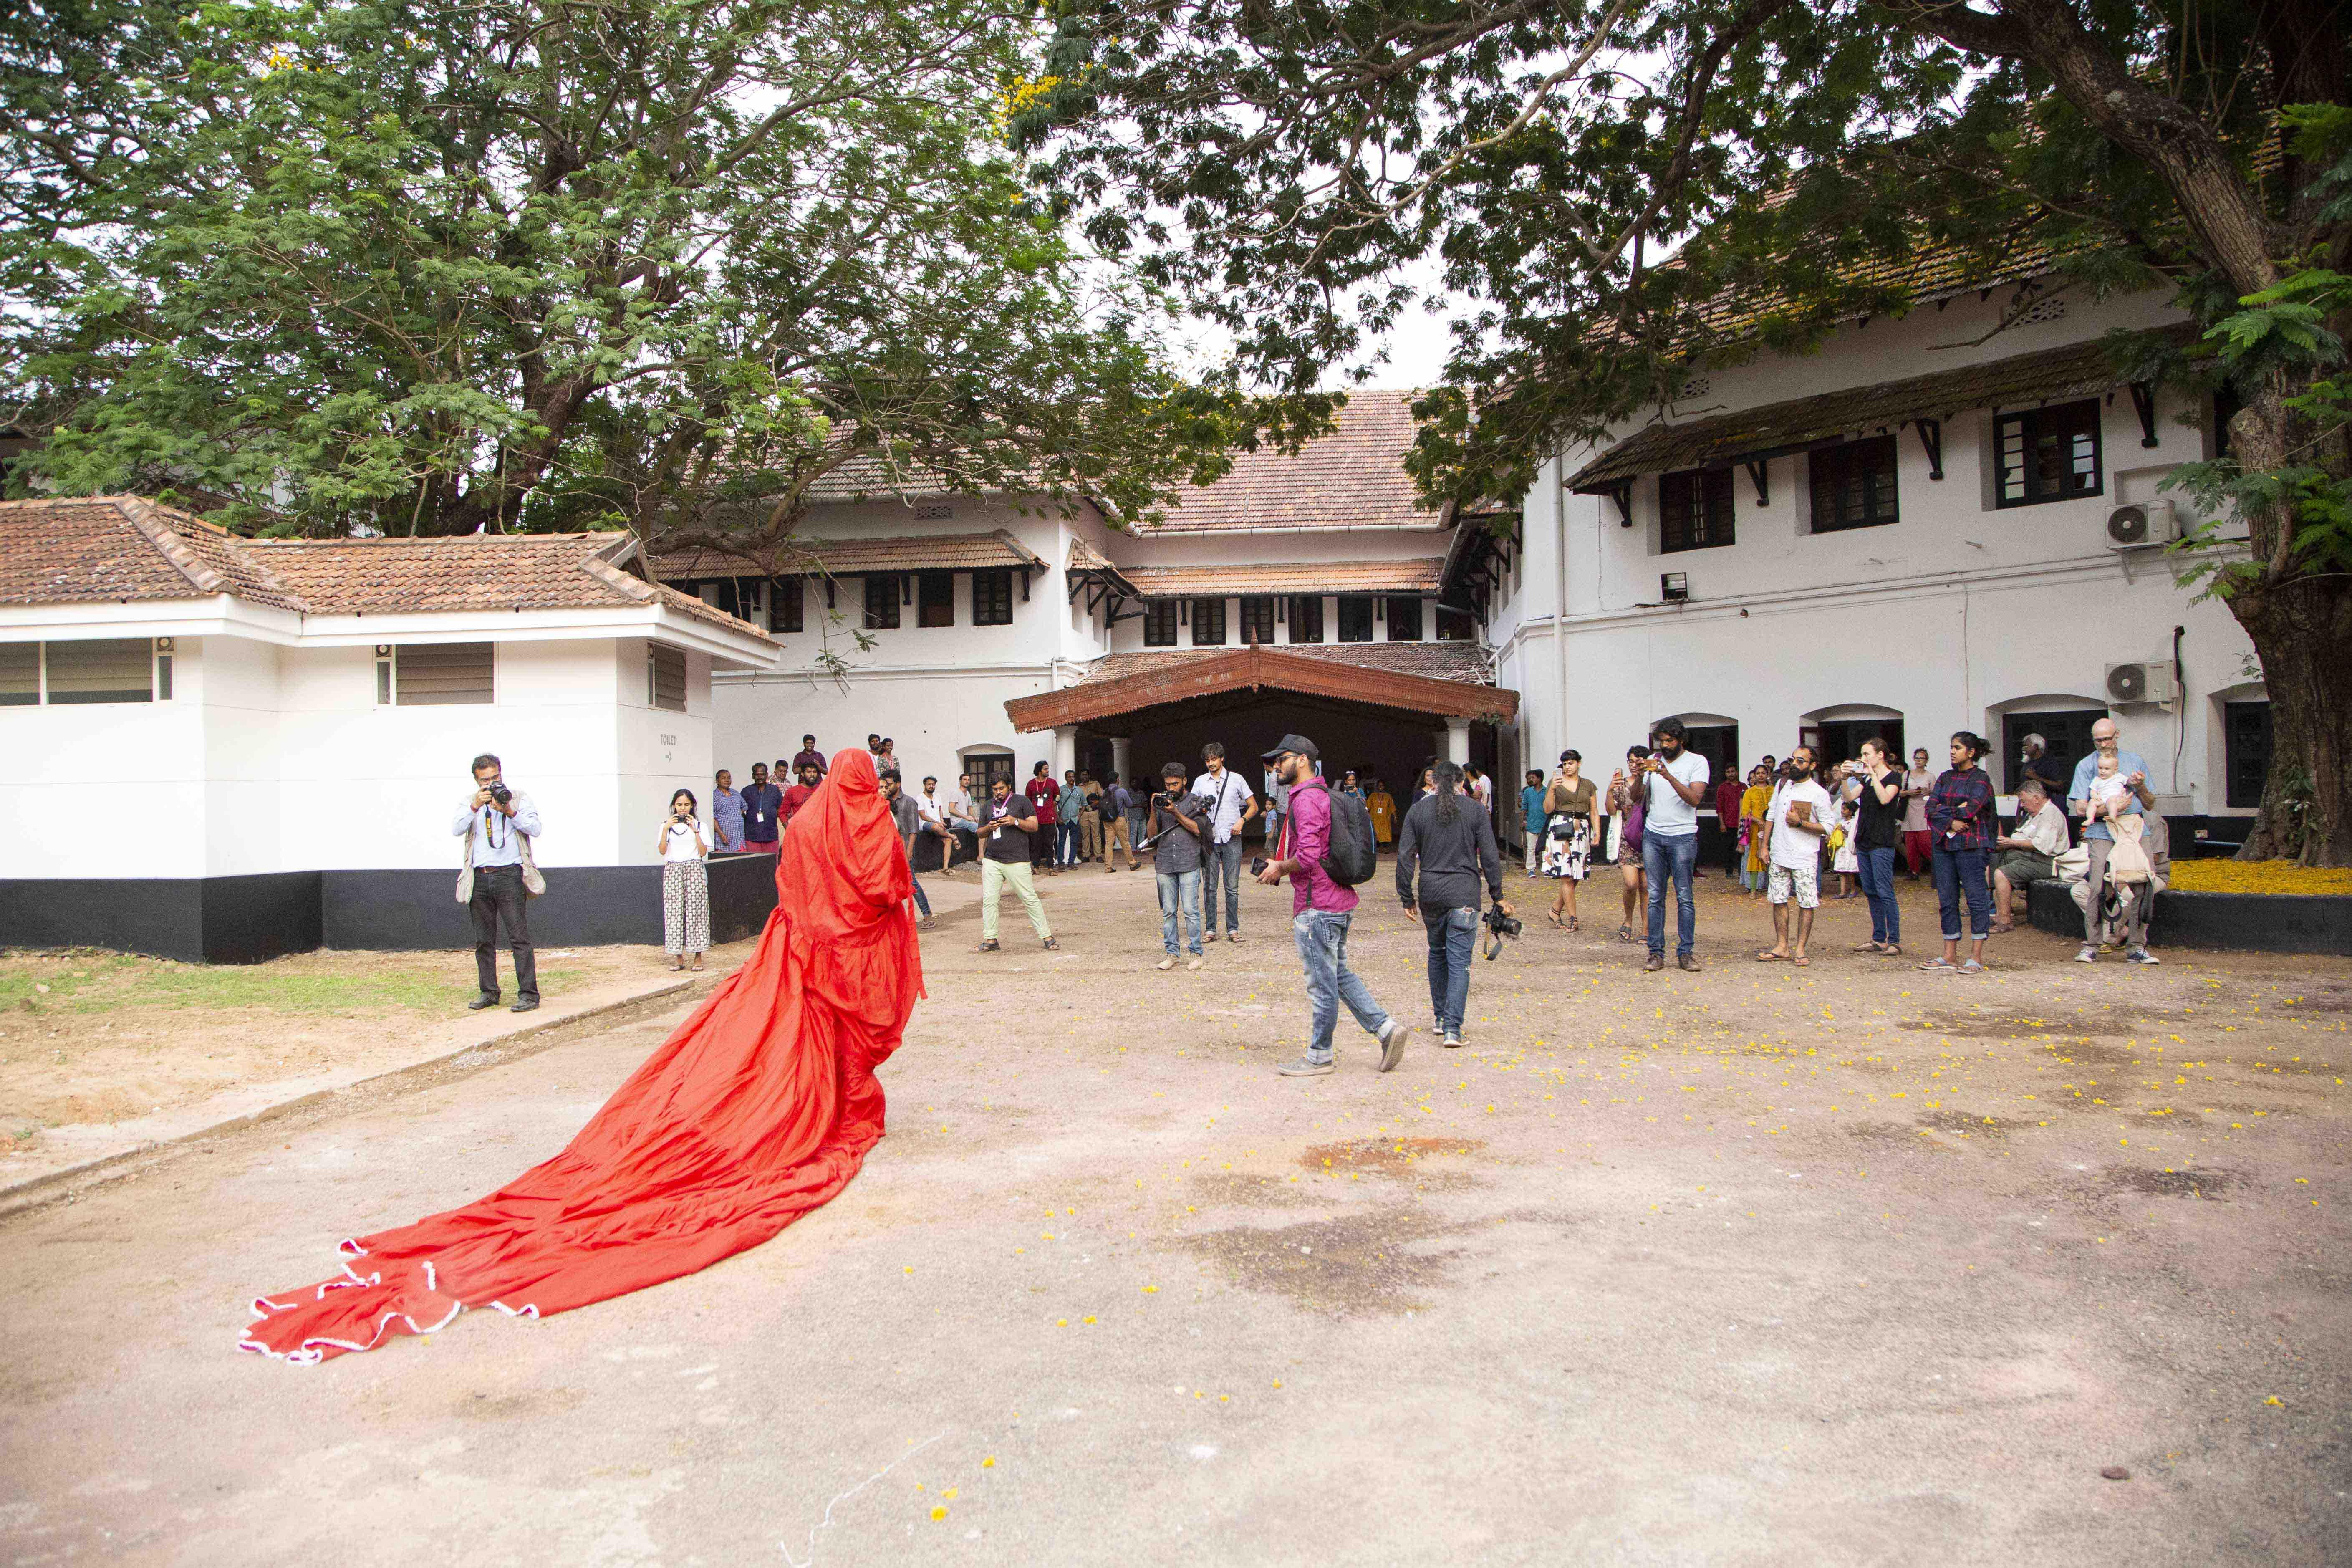 A performance by artists Aryakrishnan (Biennale artist), Gee Imaan Semmalar, and Raju Rage at the Kochi-Muziris Biennale